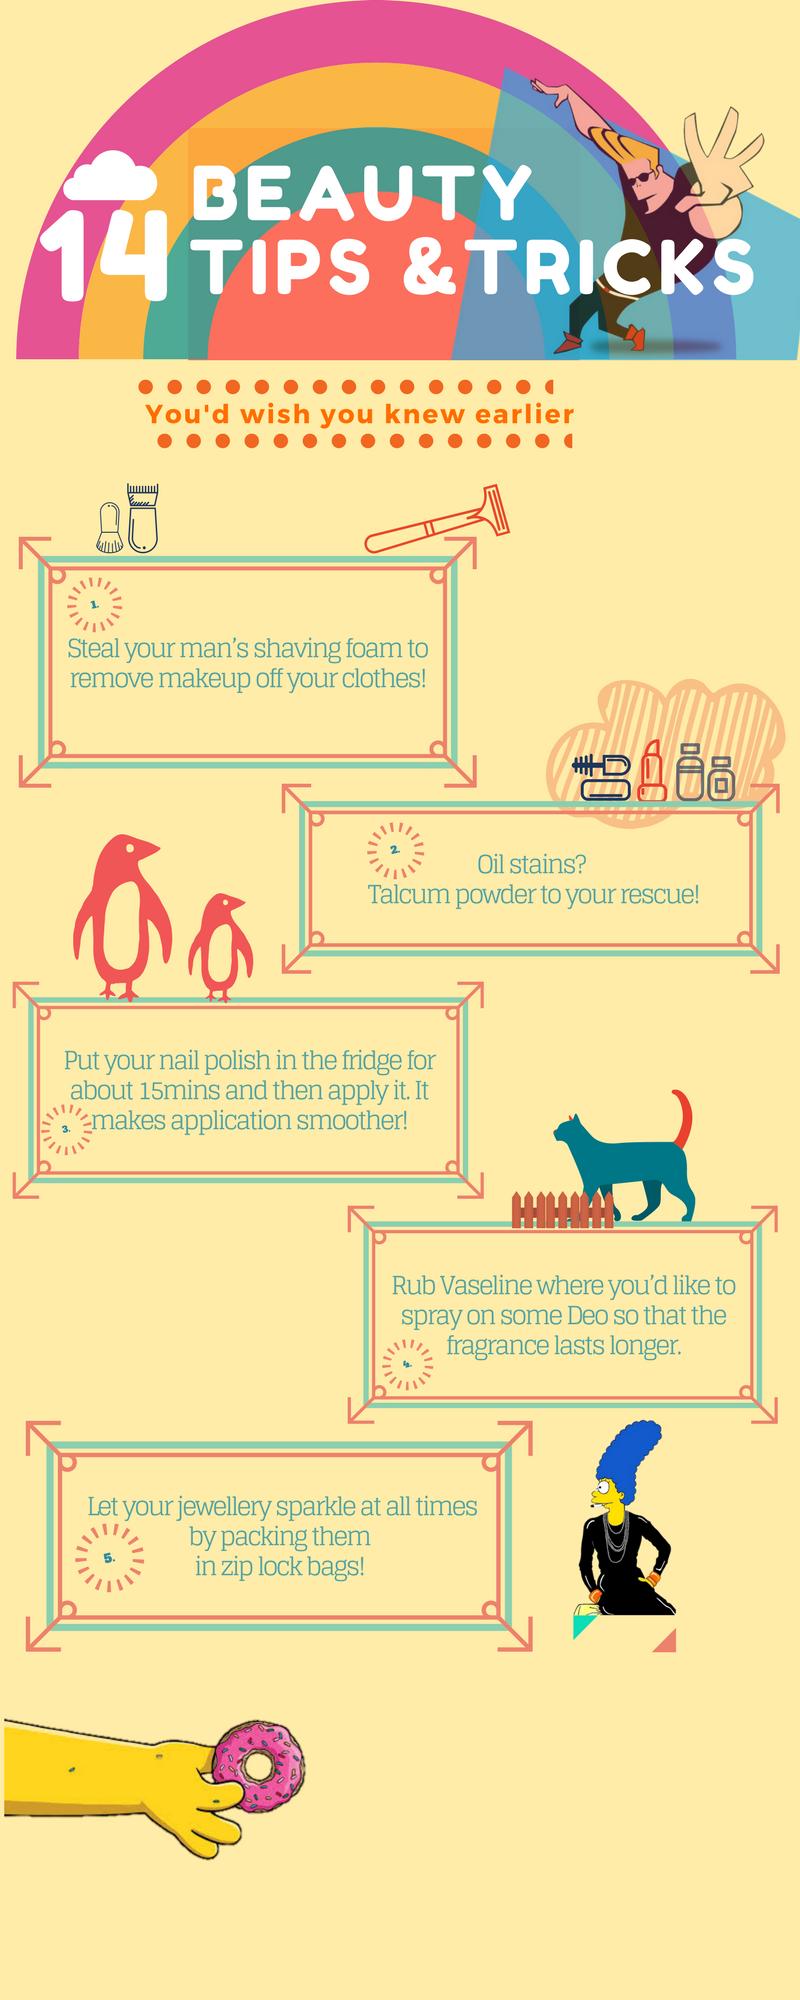 Easy Beauty tips hacks tricks infograpic